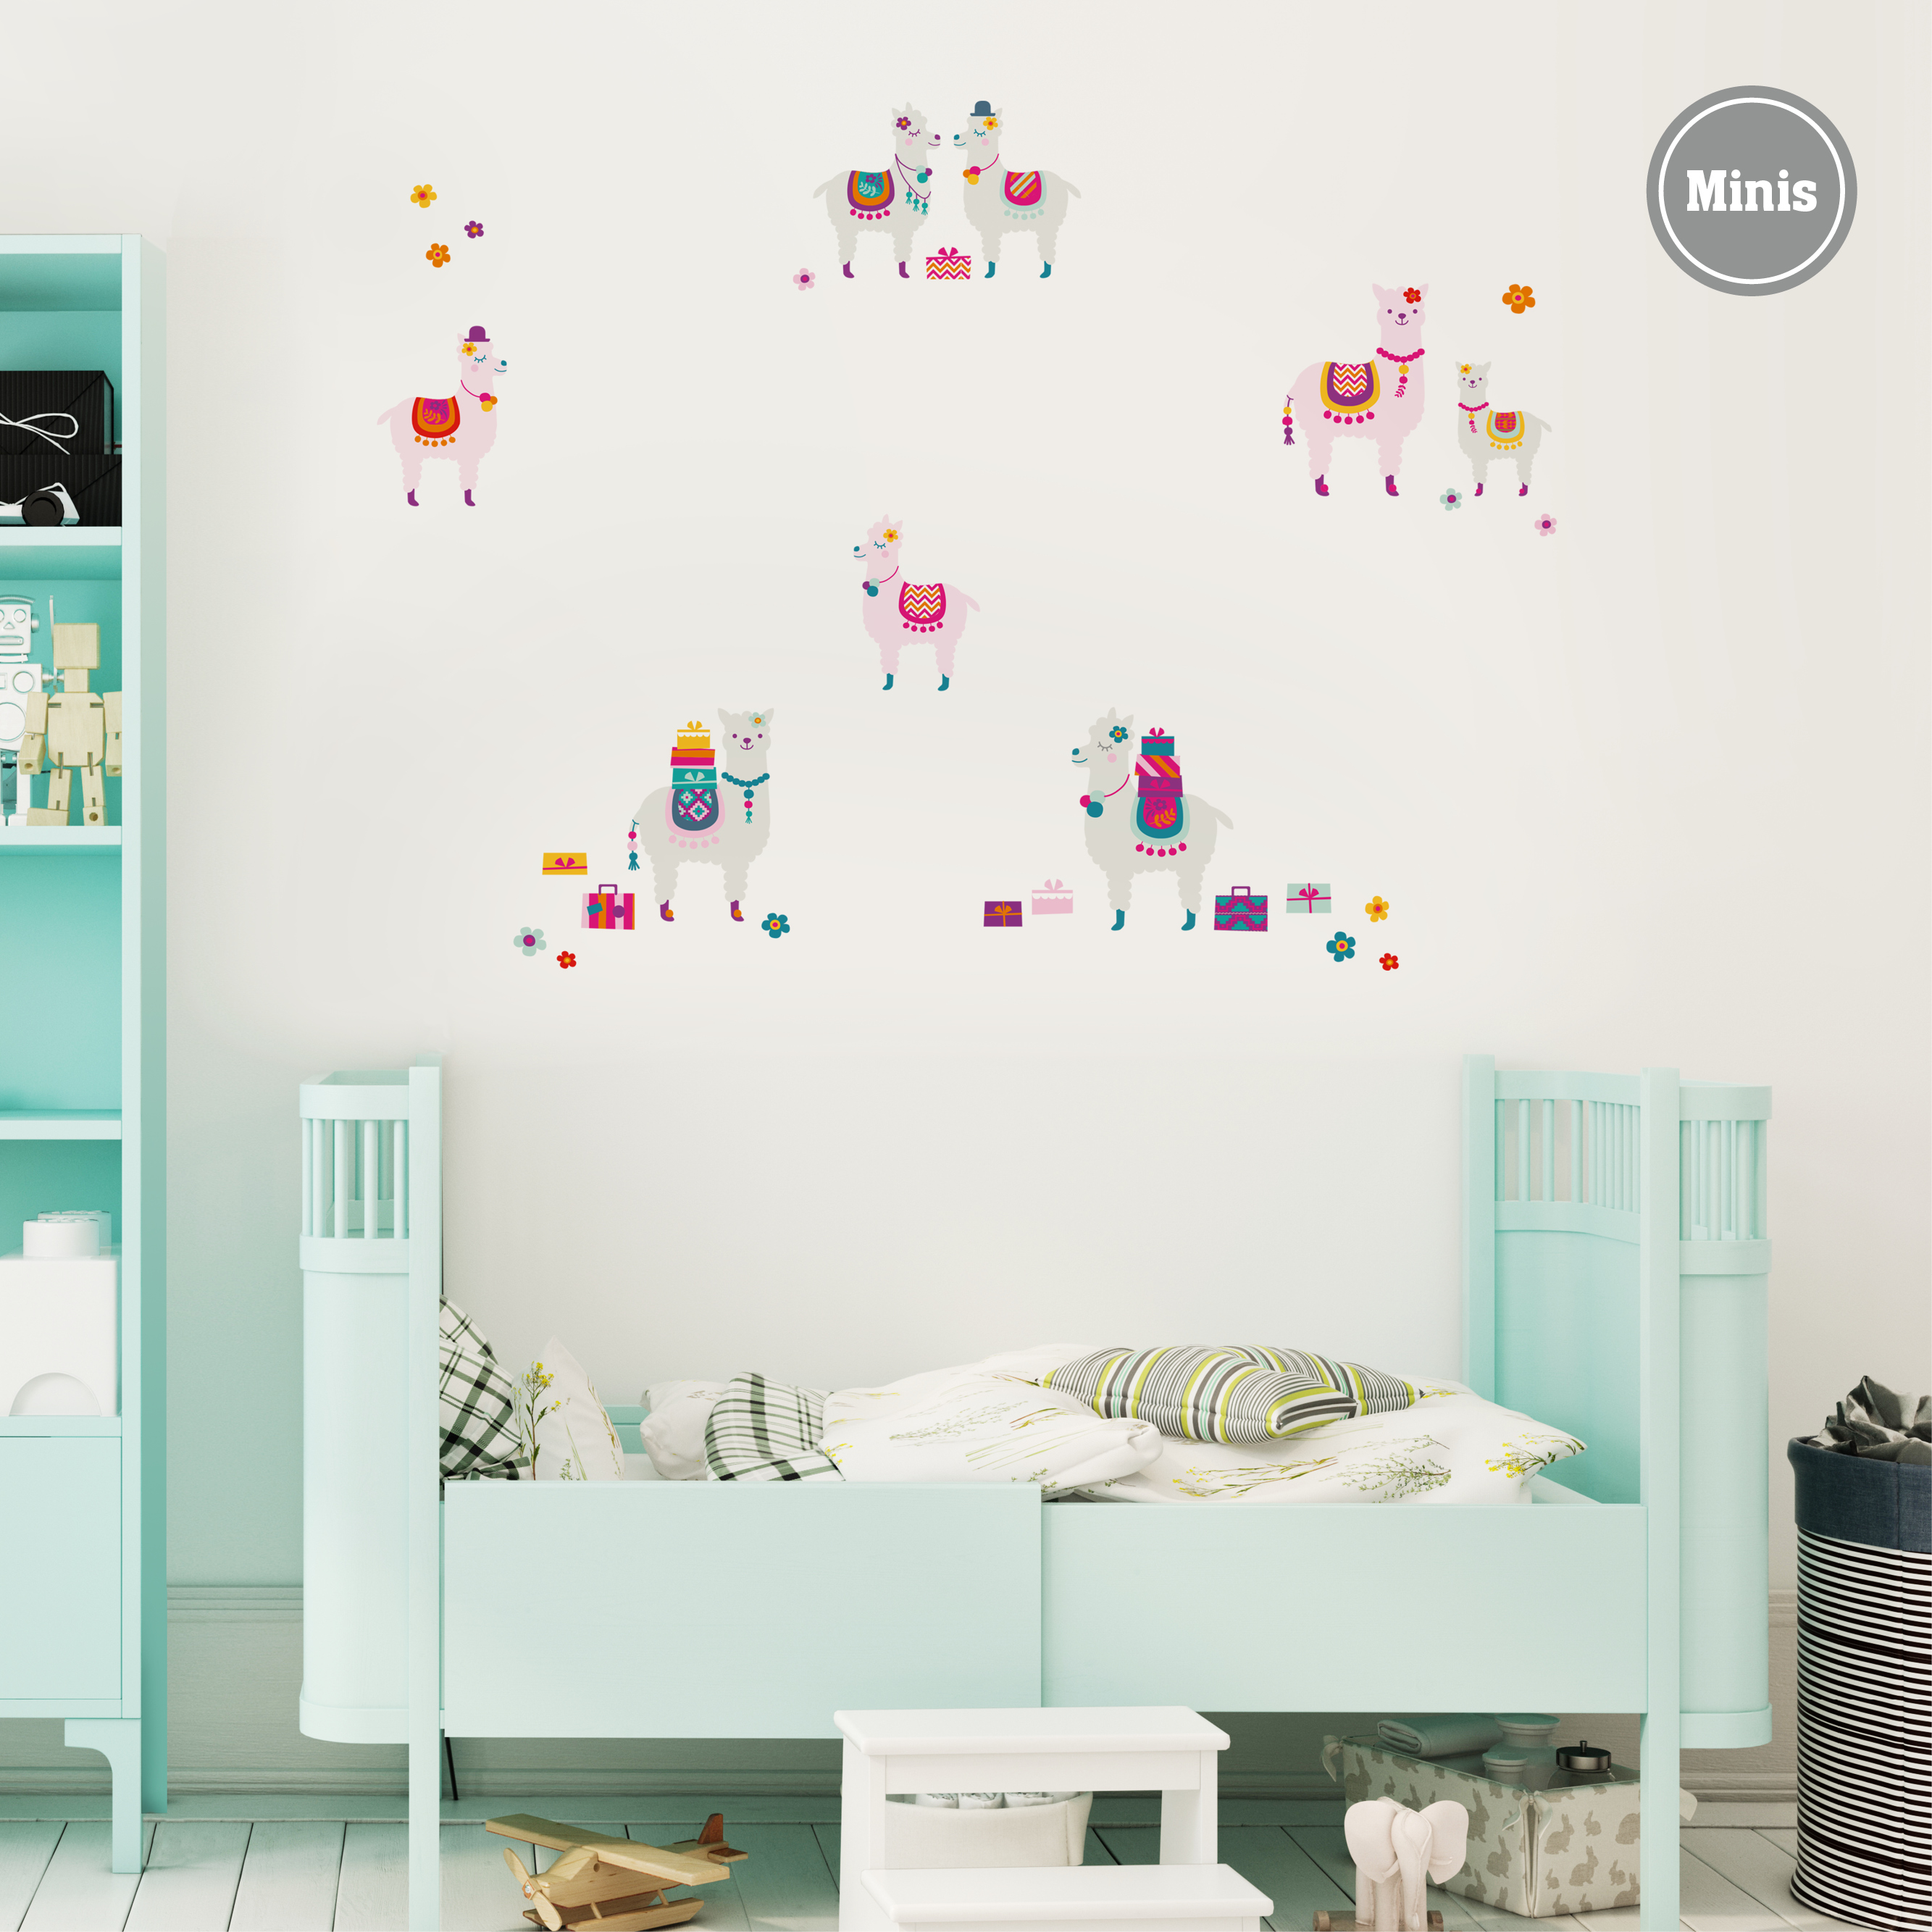 Wandtattoo Amazing Alpacas Wandtattoos Fur Madchen Wandtattoos Wandgestaltung Kinderzimmer Anna Wand Design